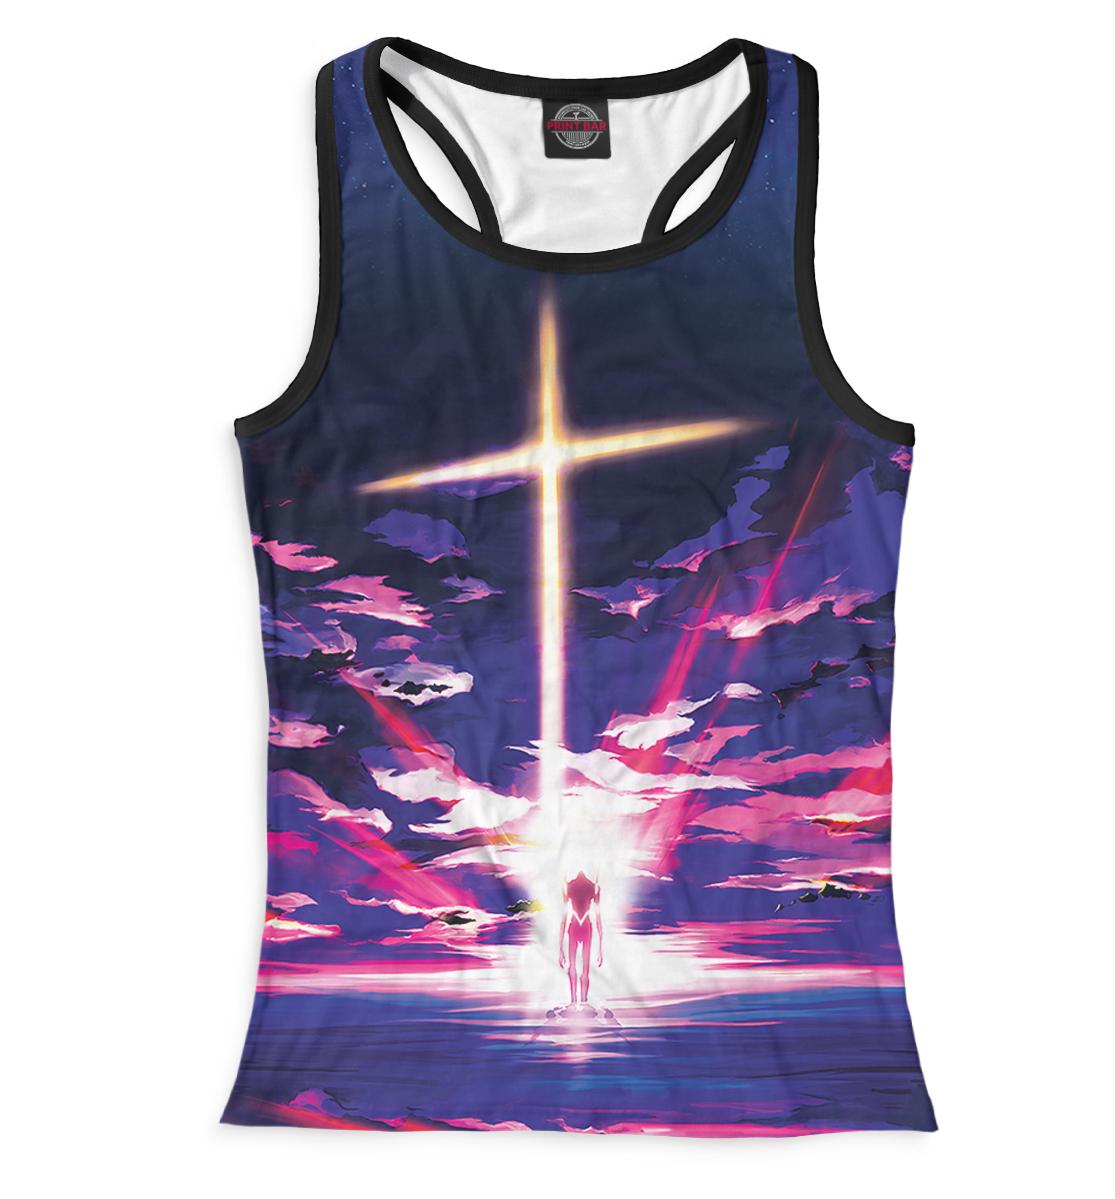 Купить Neon Genesis Evangelion, Printbar, Майки борцовки, EVA-534396-mayb-1